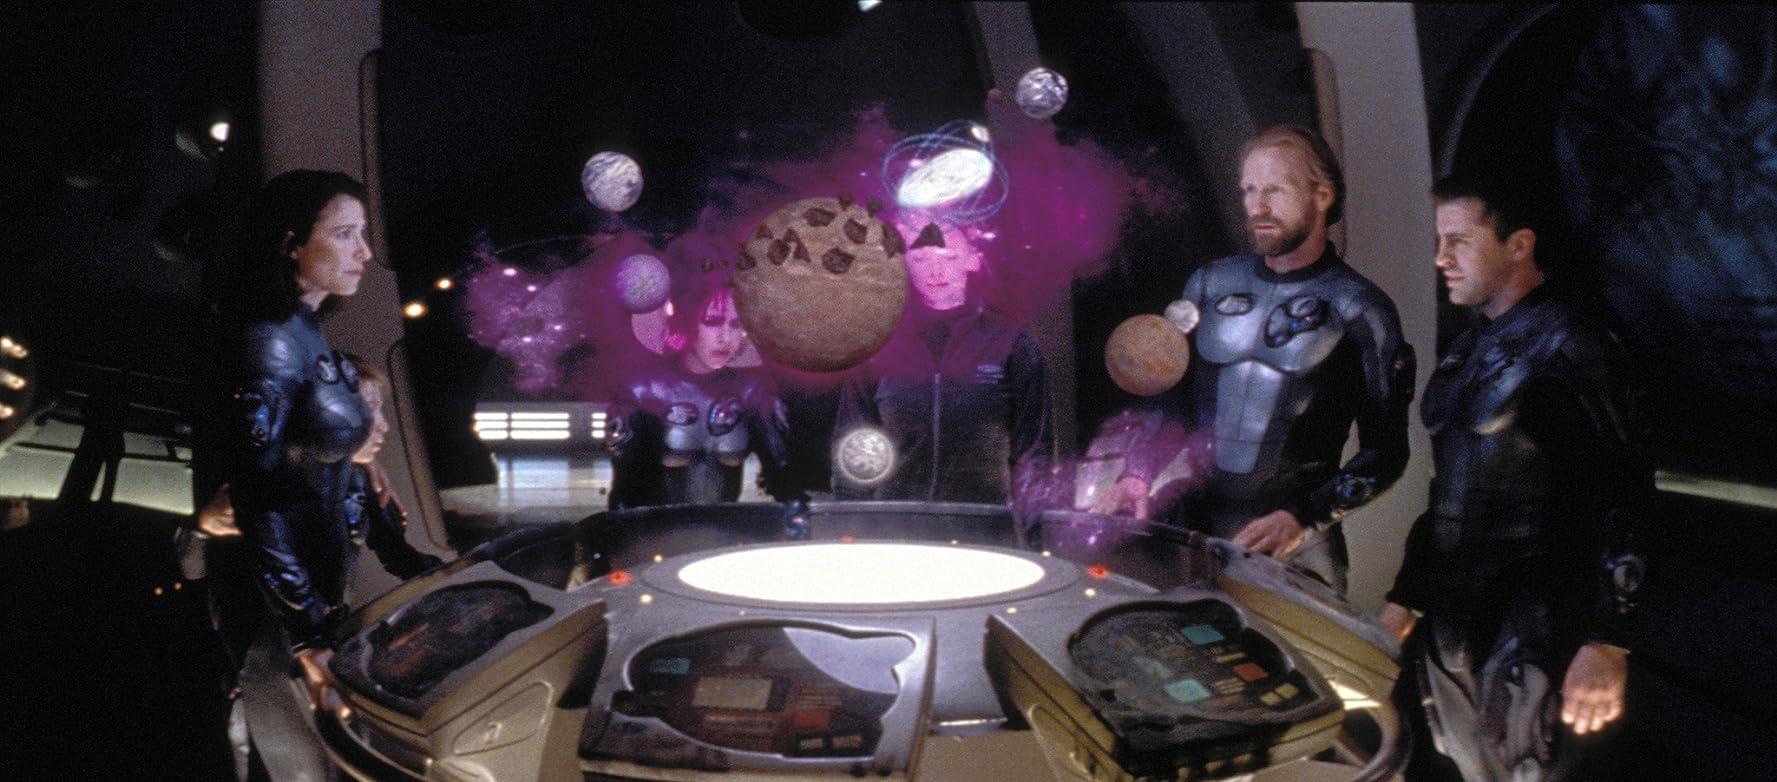 Mimi Rogers, Lacey Chabert, William Hurt, Heather Graham, Matt LeBlanc, and Jack Johnson in Lost in Space (1998)